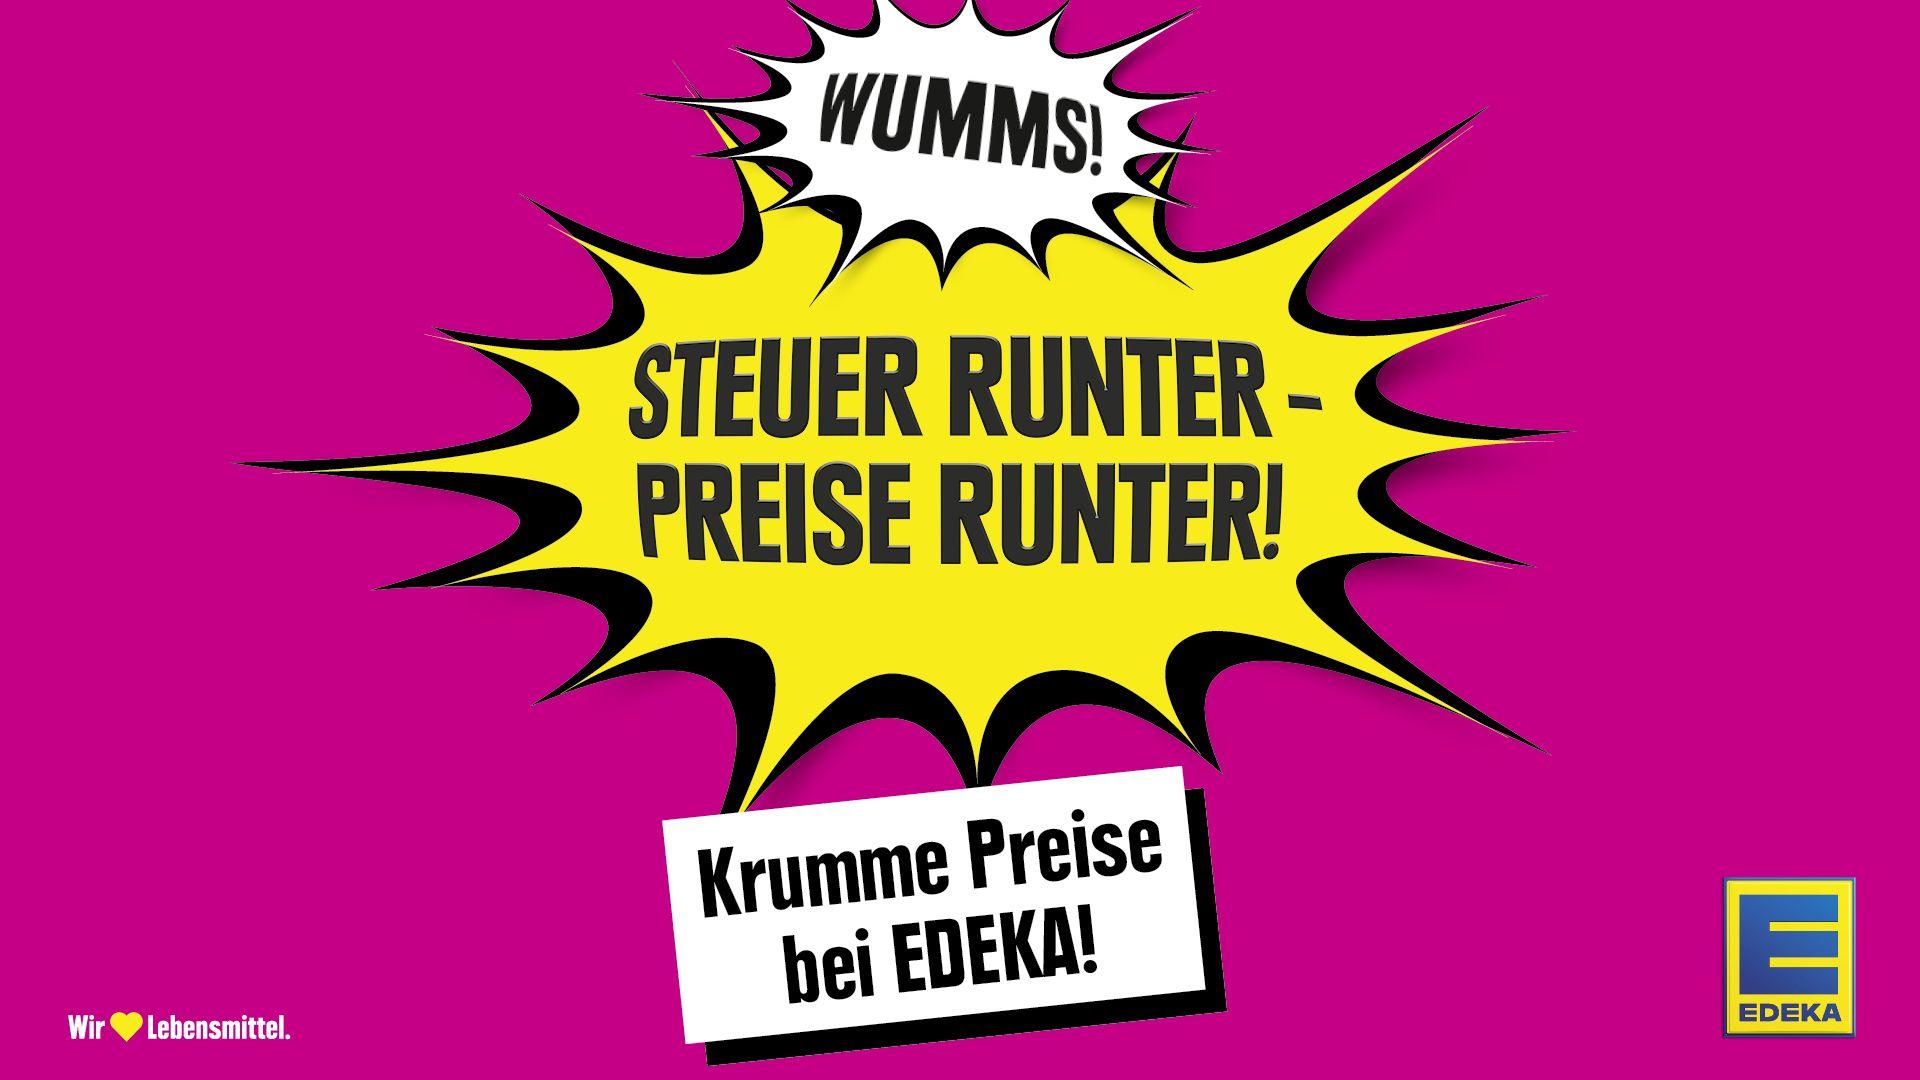 Read more about the article WUMMS! Steuer runter! Preise runter! Krumme Preise bei EDEKA